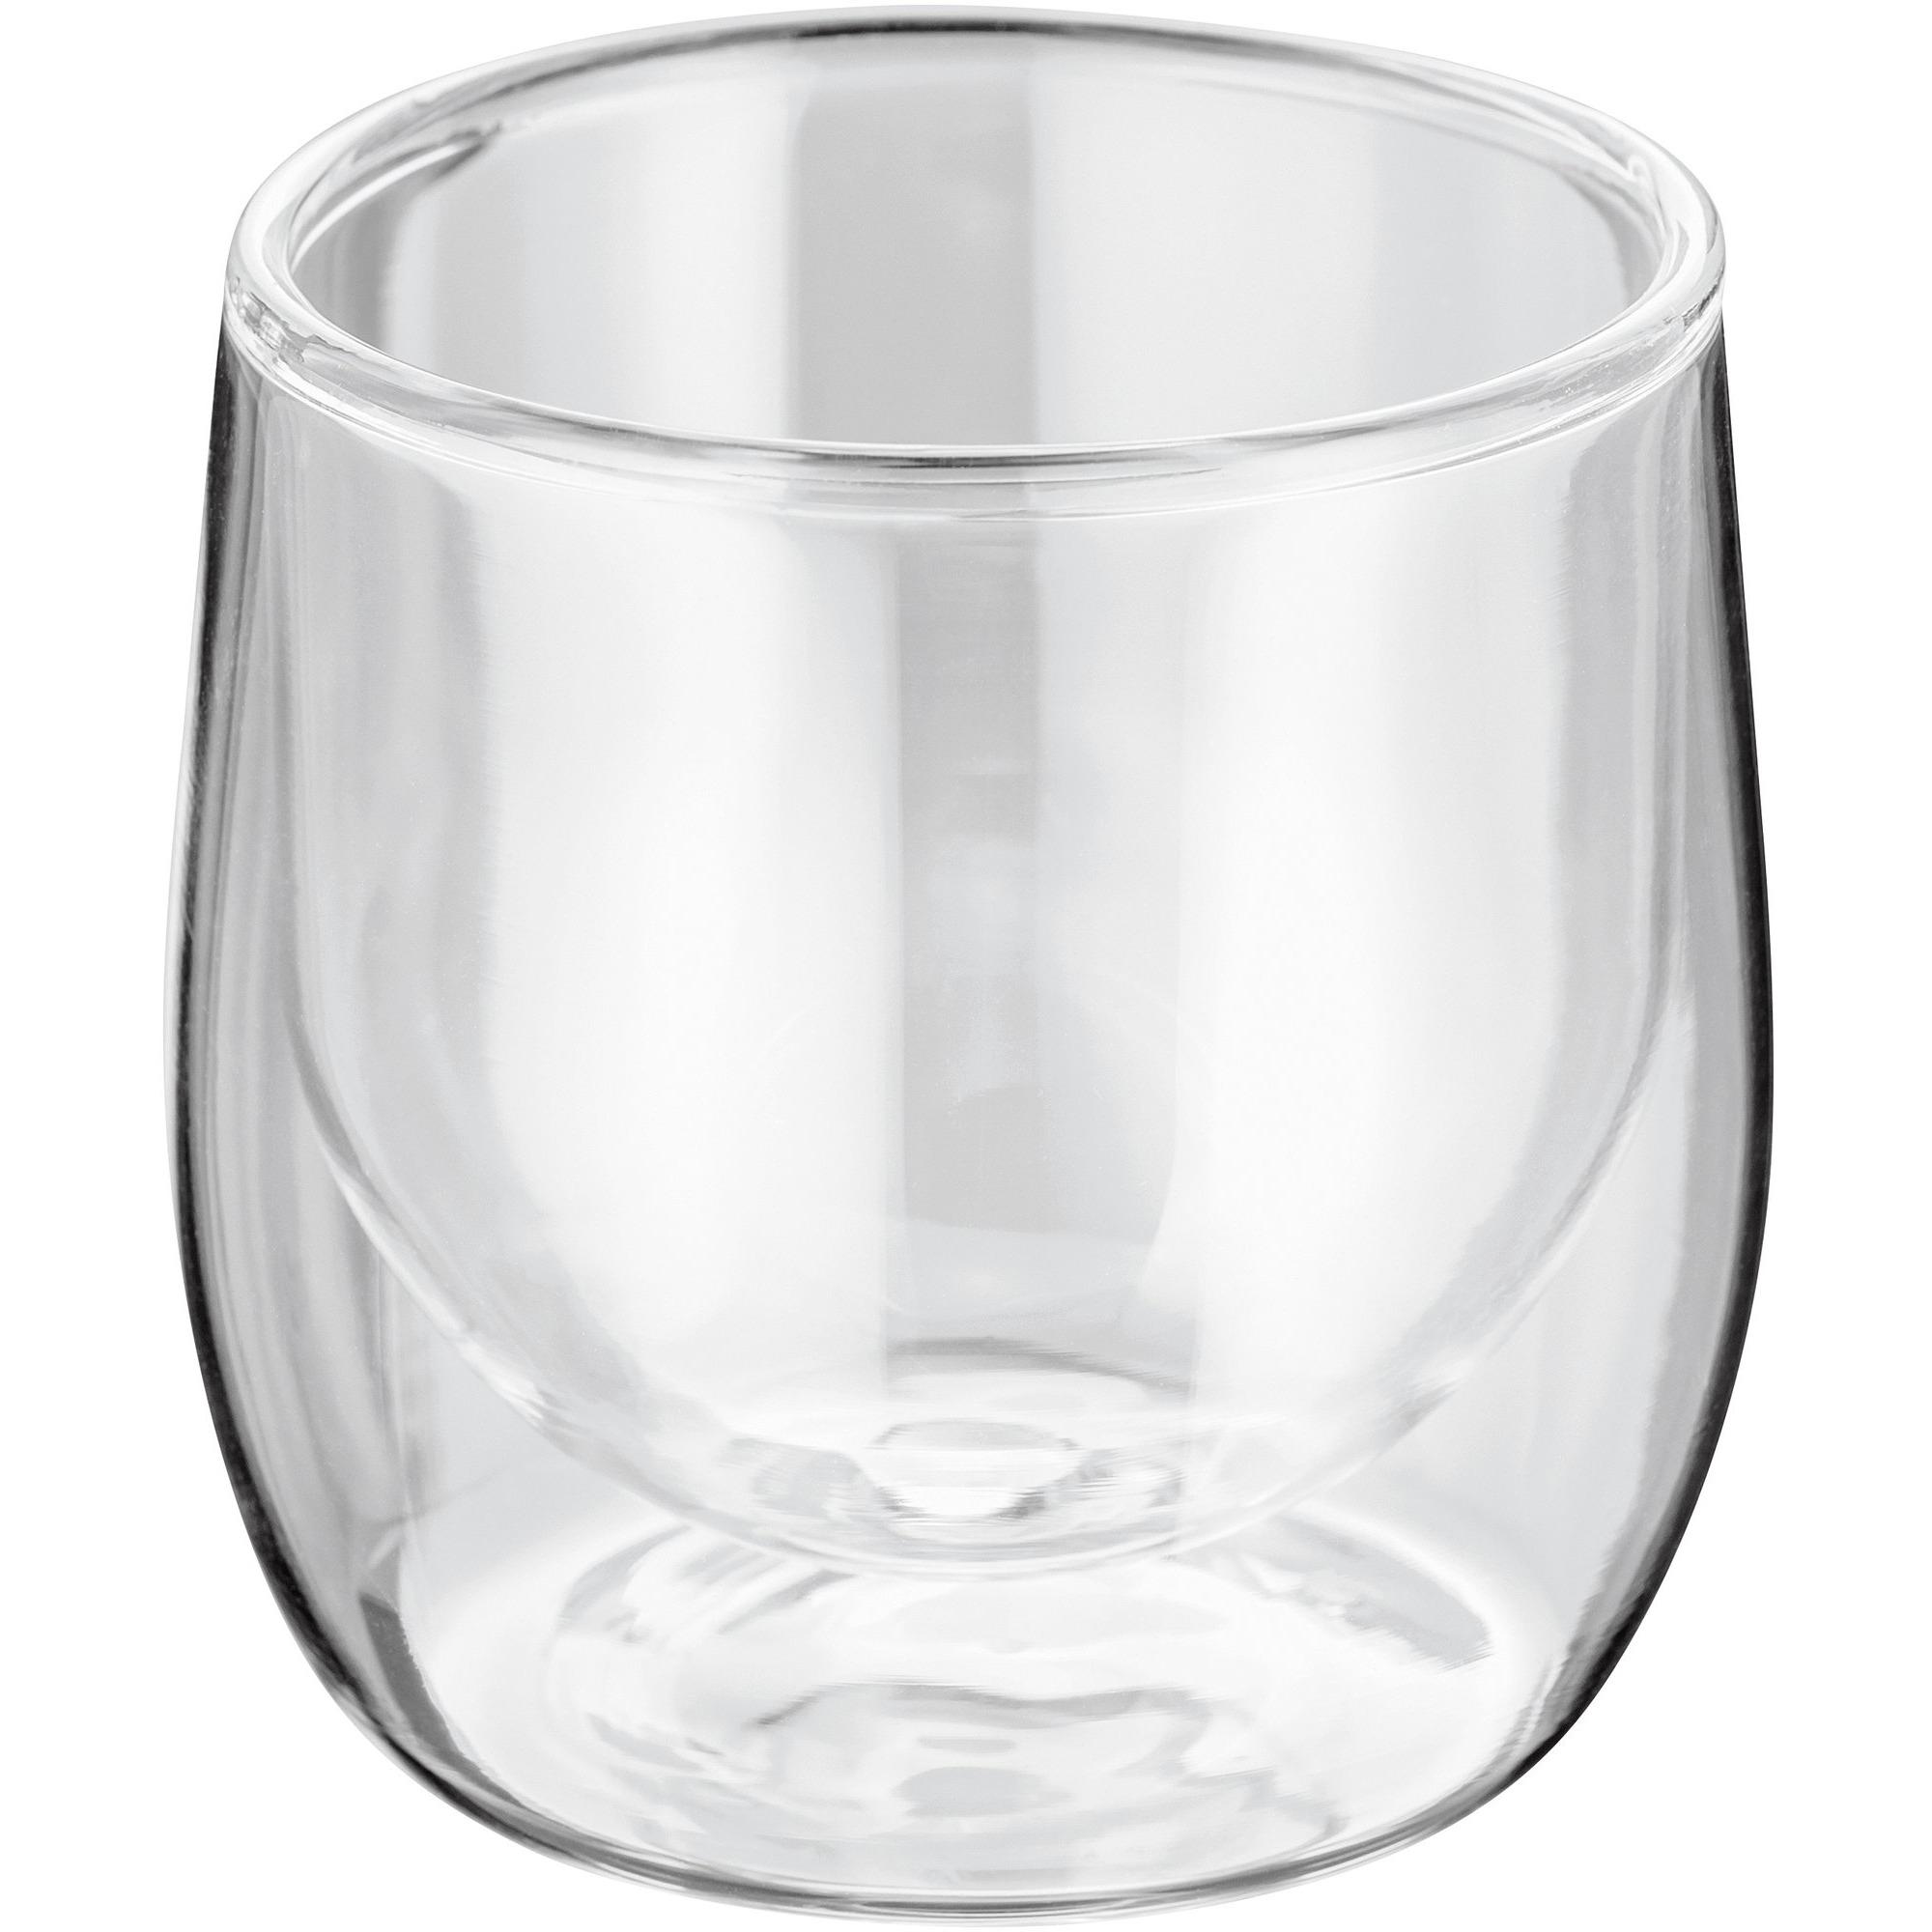 Horwood Dubbelväggat glas 250 ml, 2 st